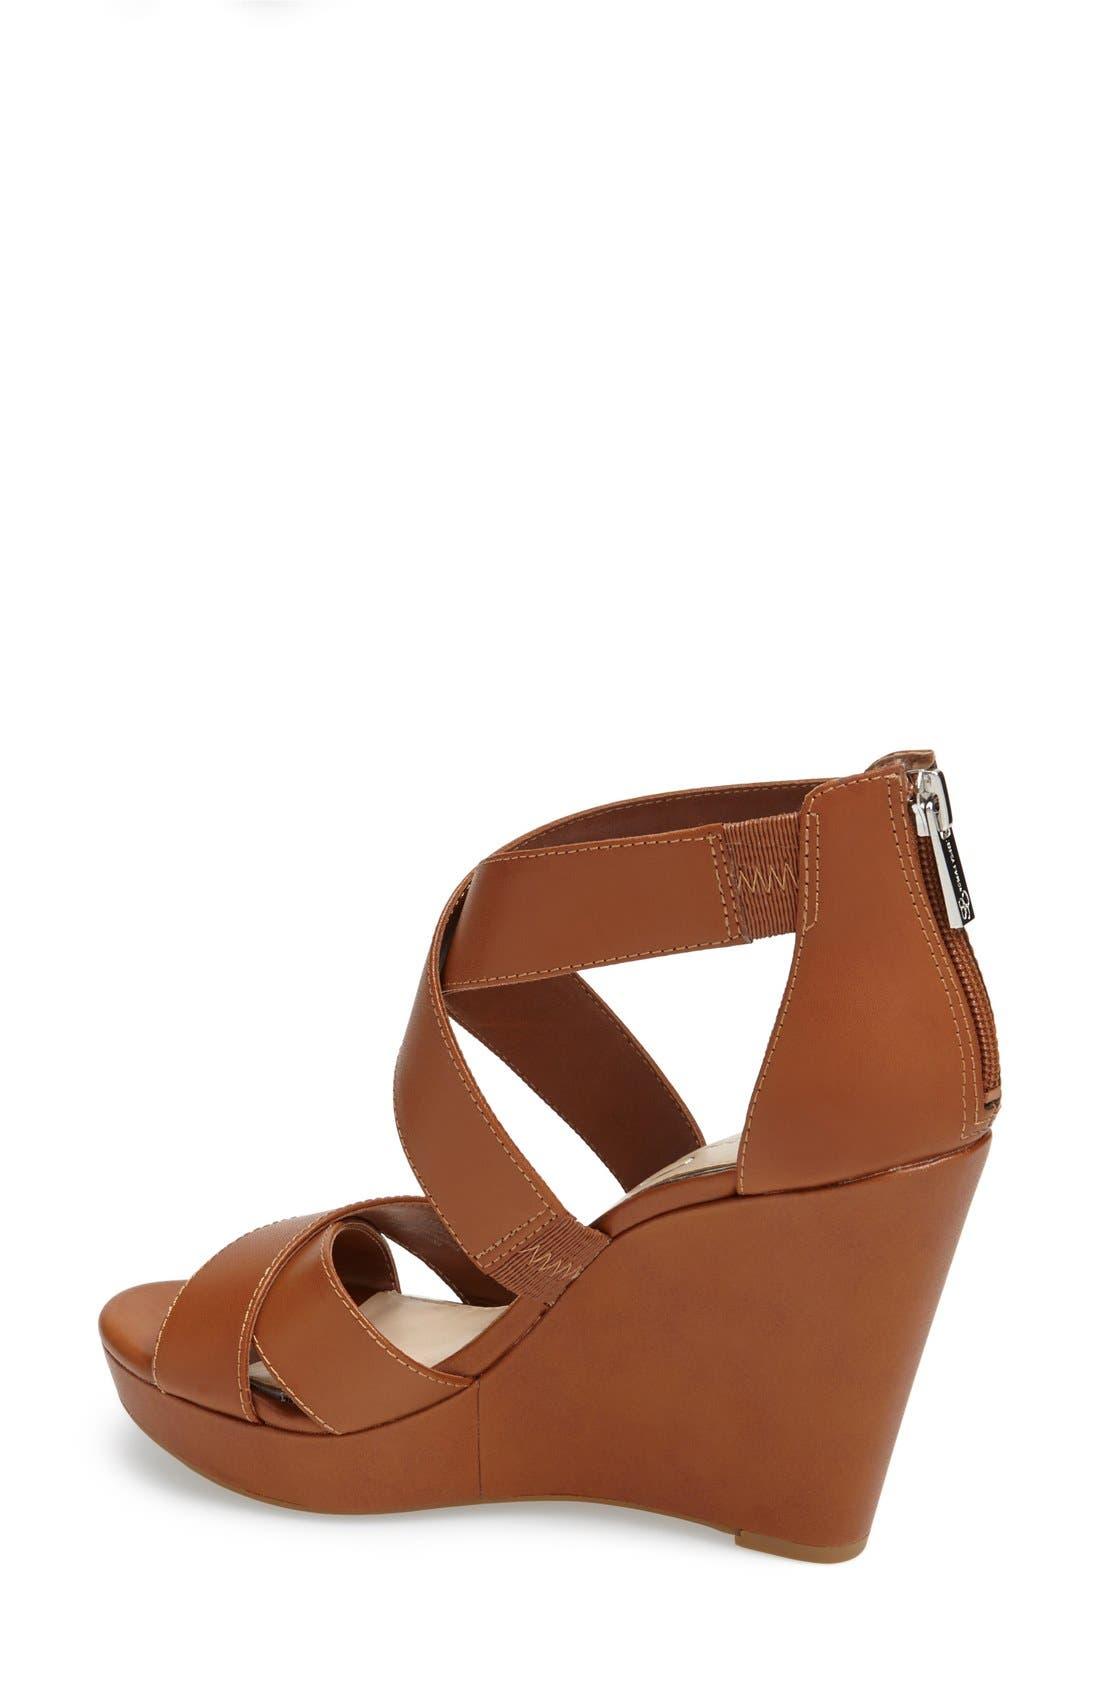 Alternate Image 2  - Jessica Simpson 'Jadyn' Strappy Wedge Sandal (Women)